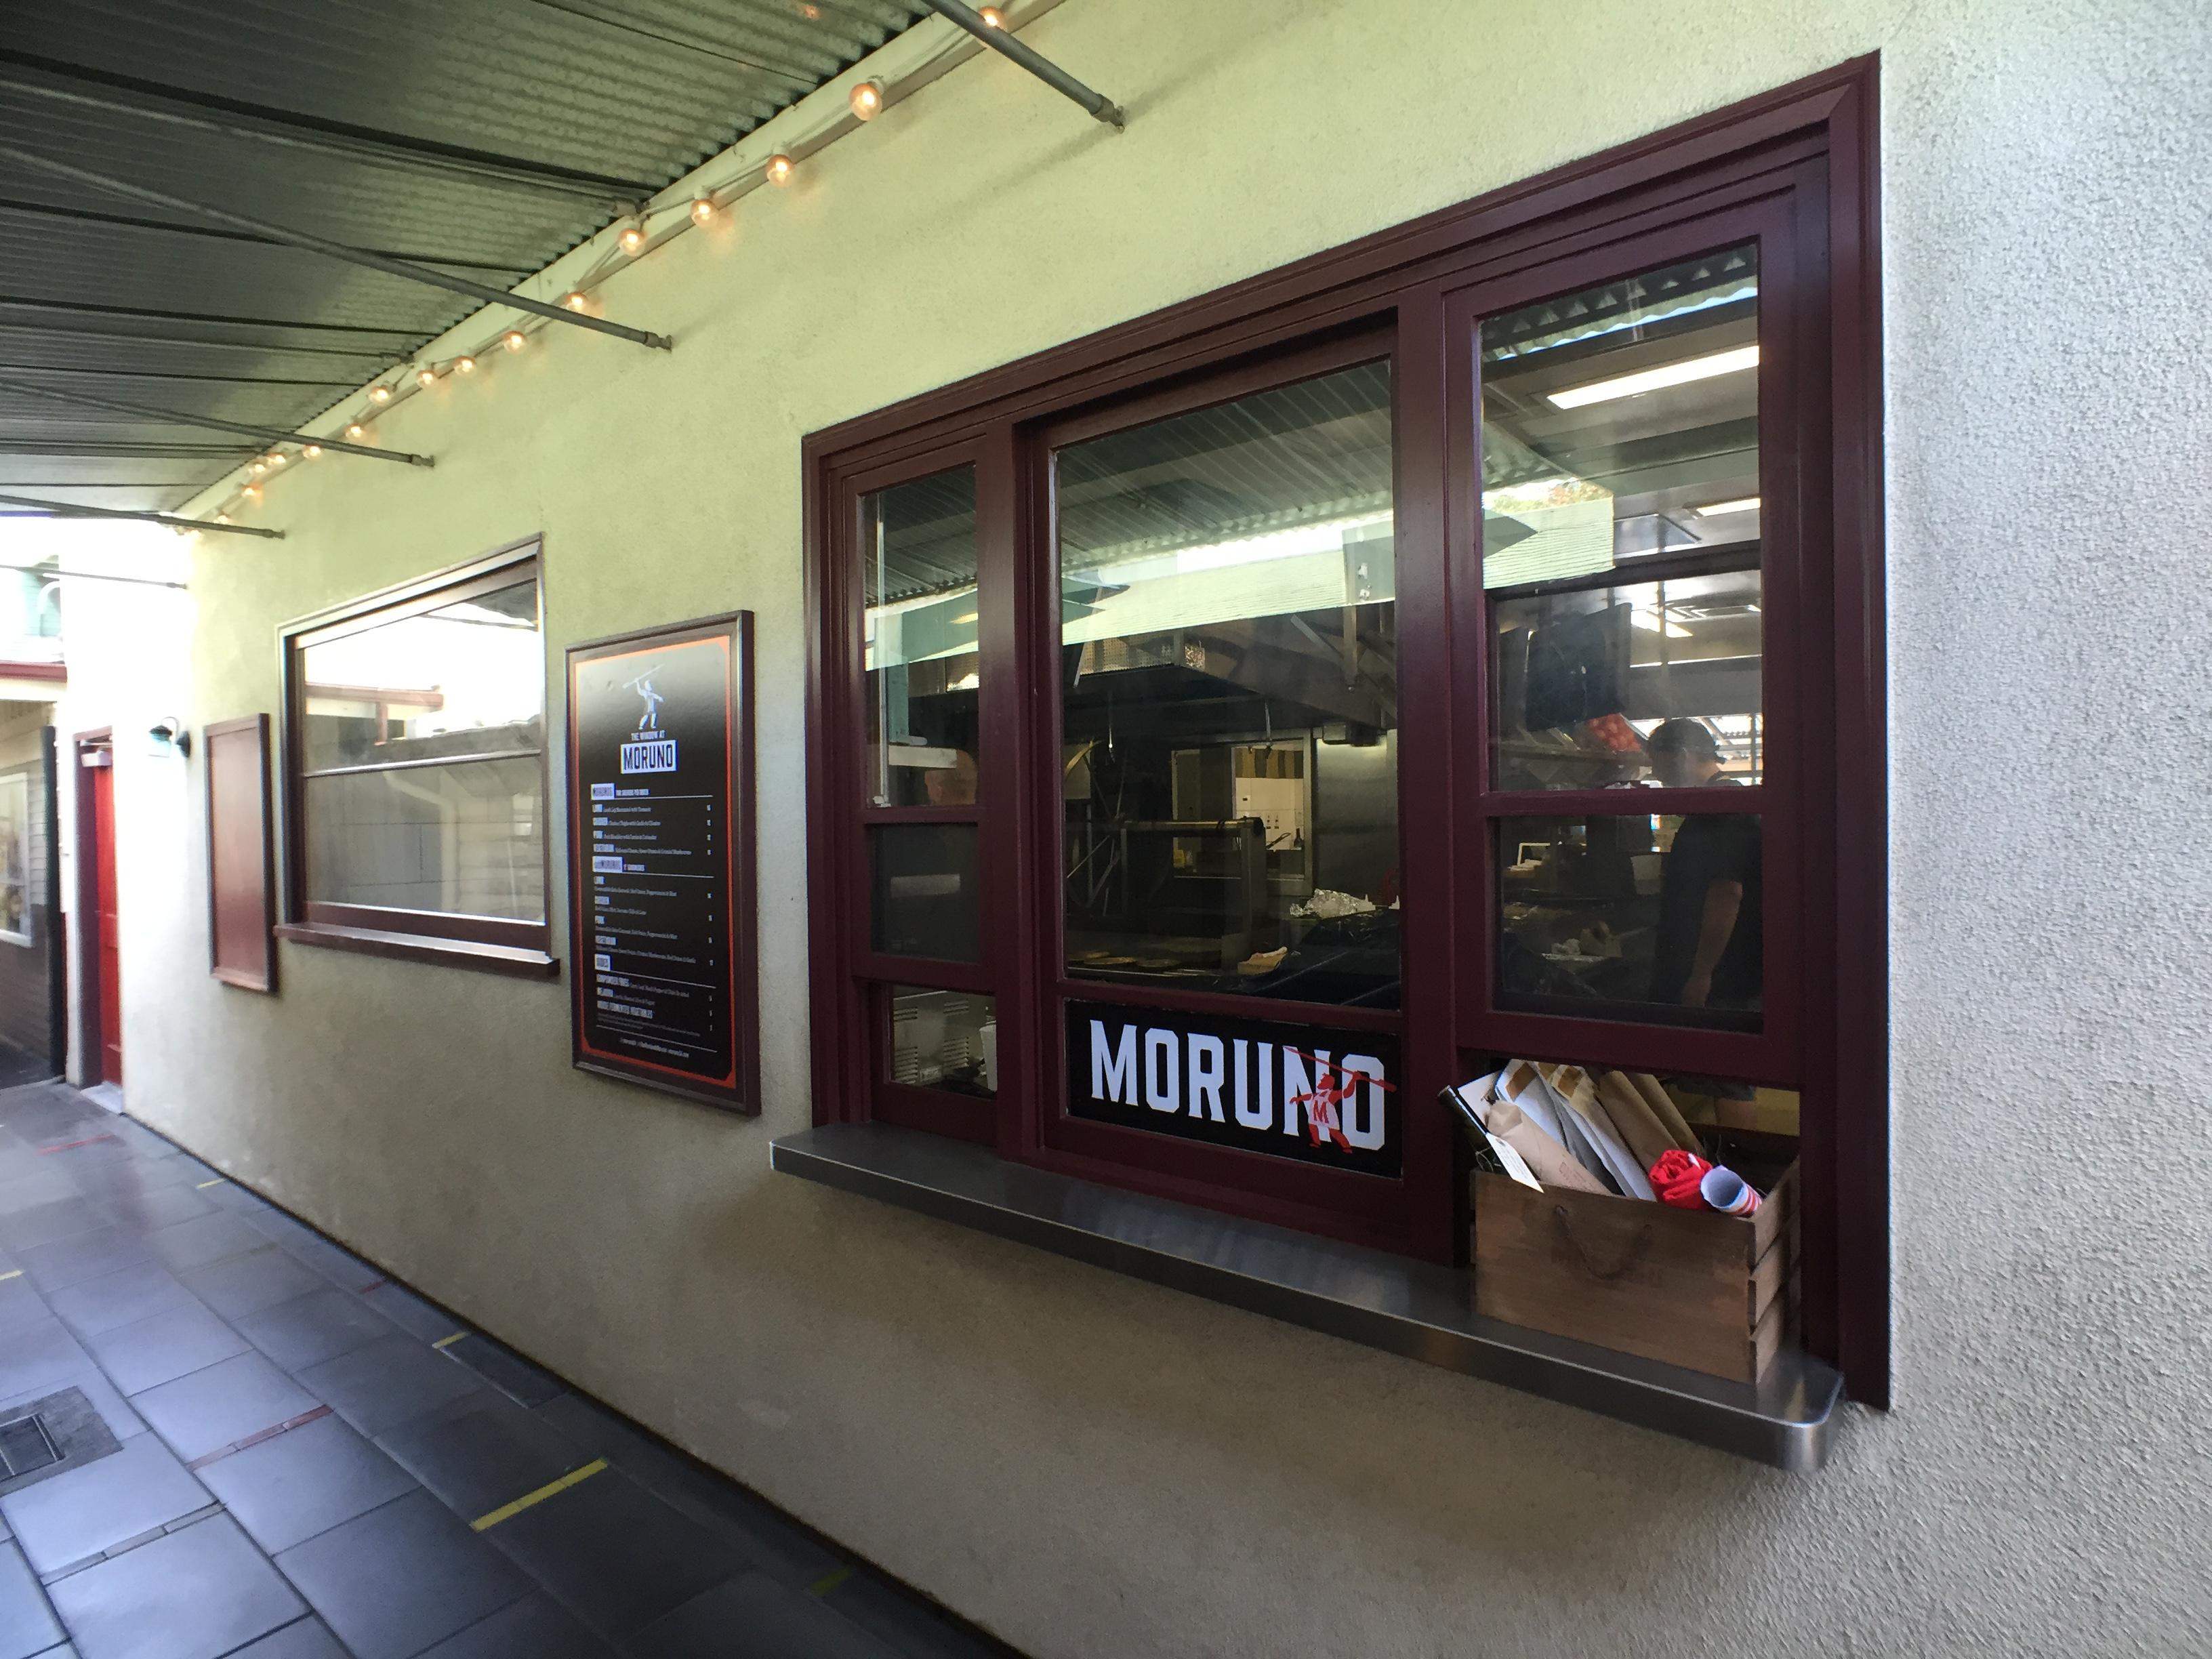 The Window at Moruno